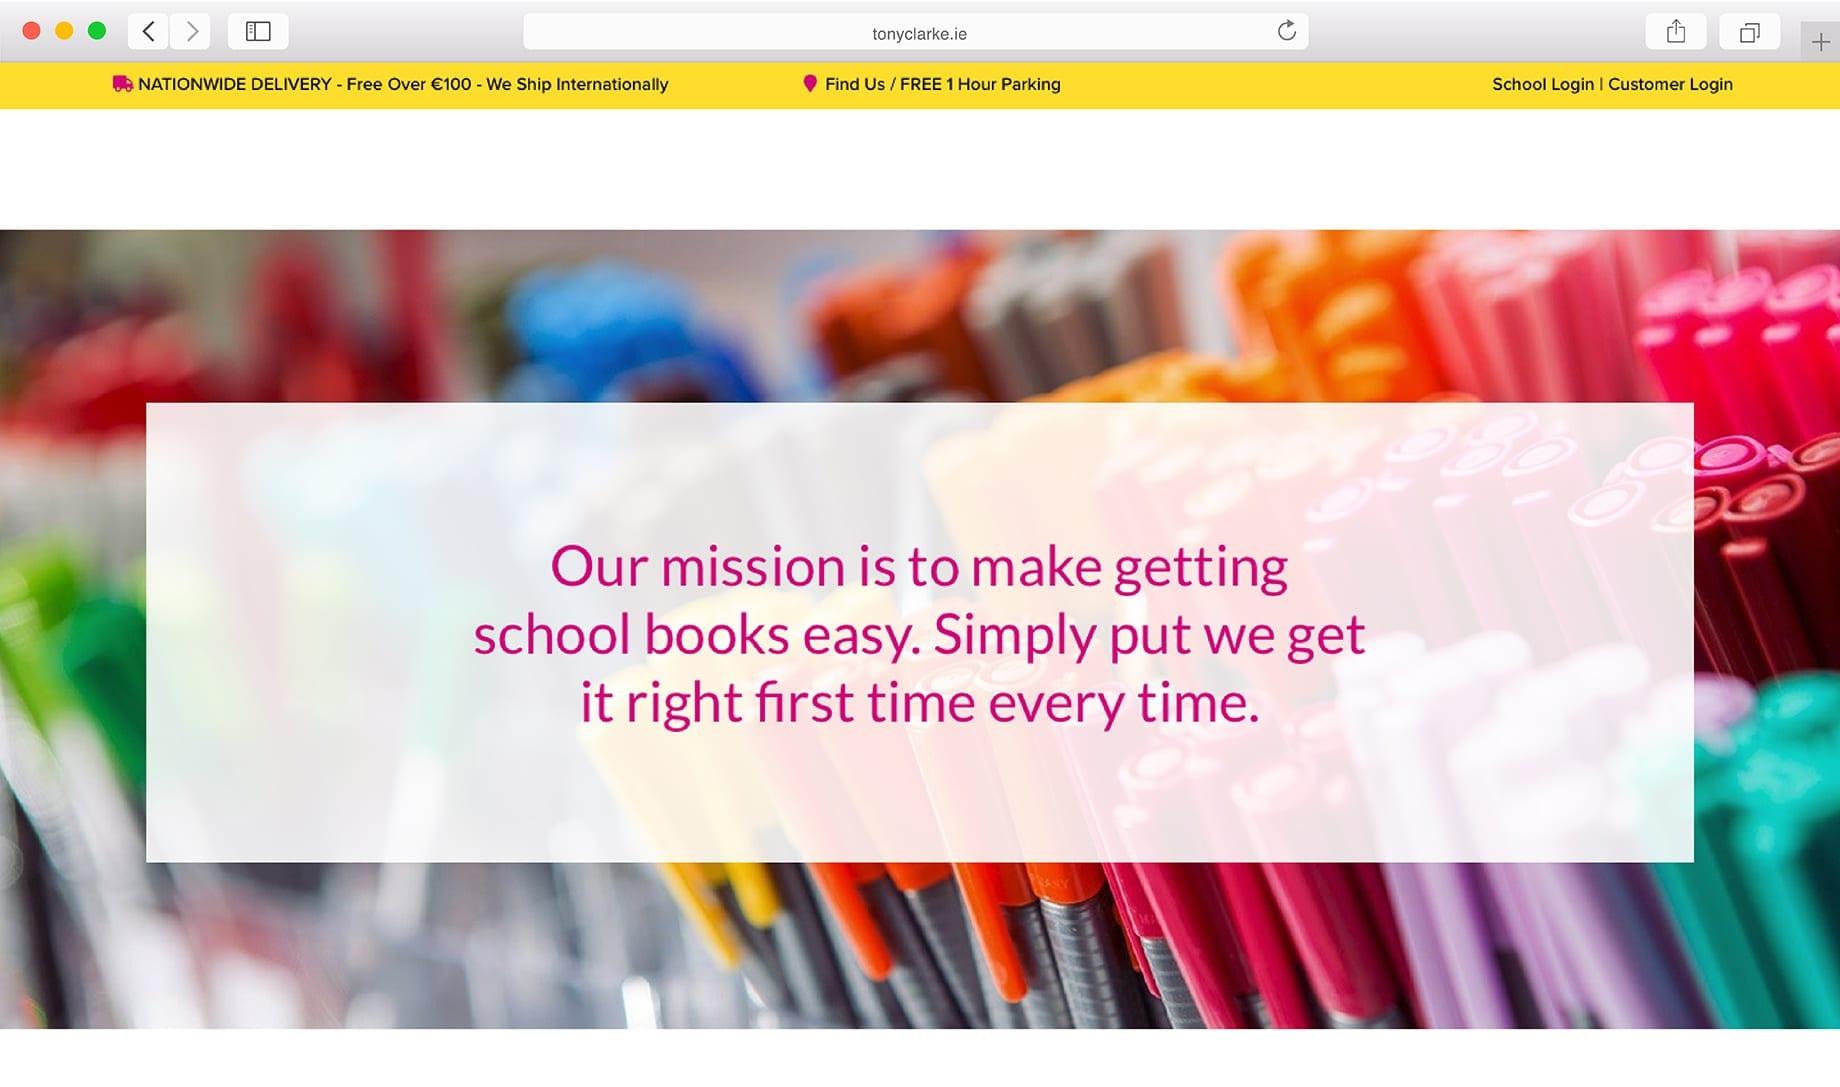 Tony Clarkes Website Design Limerick